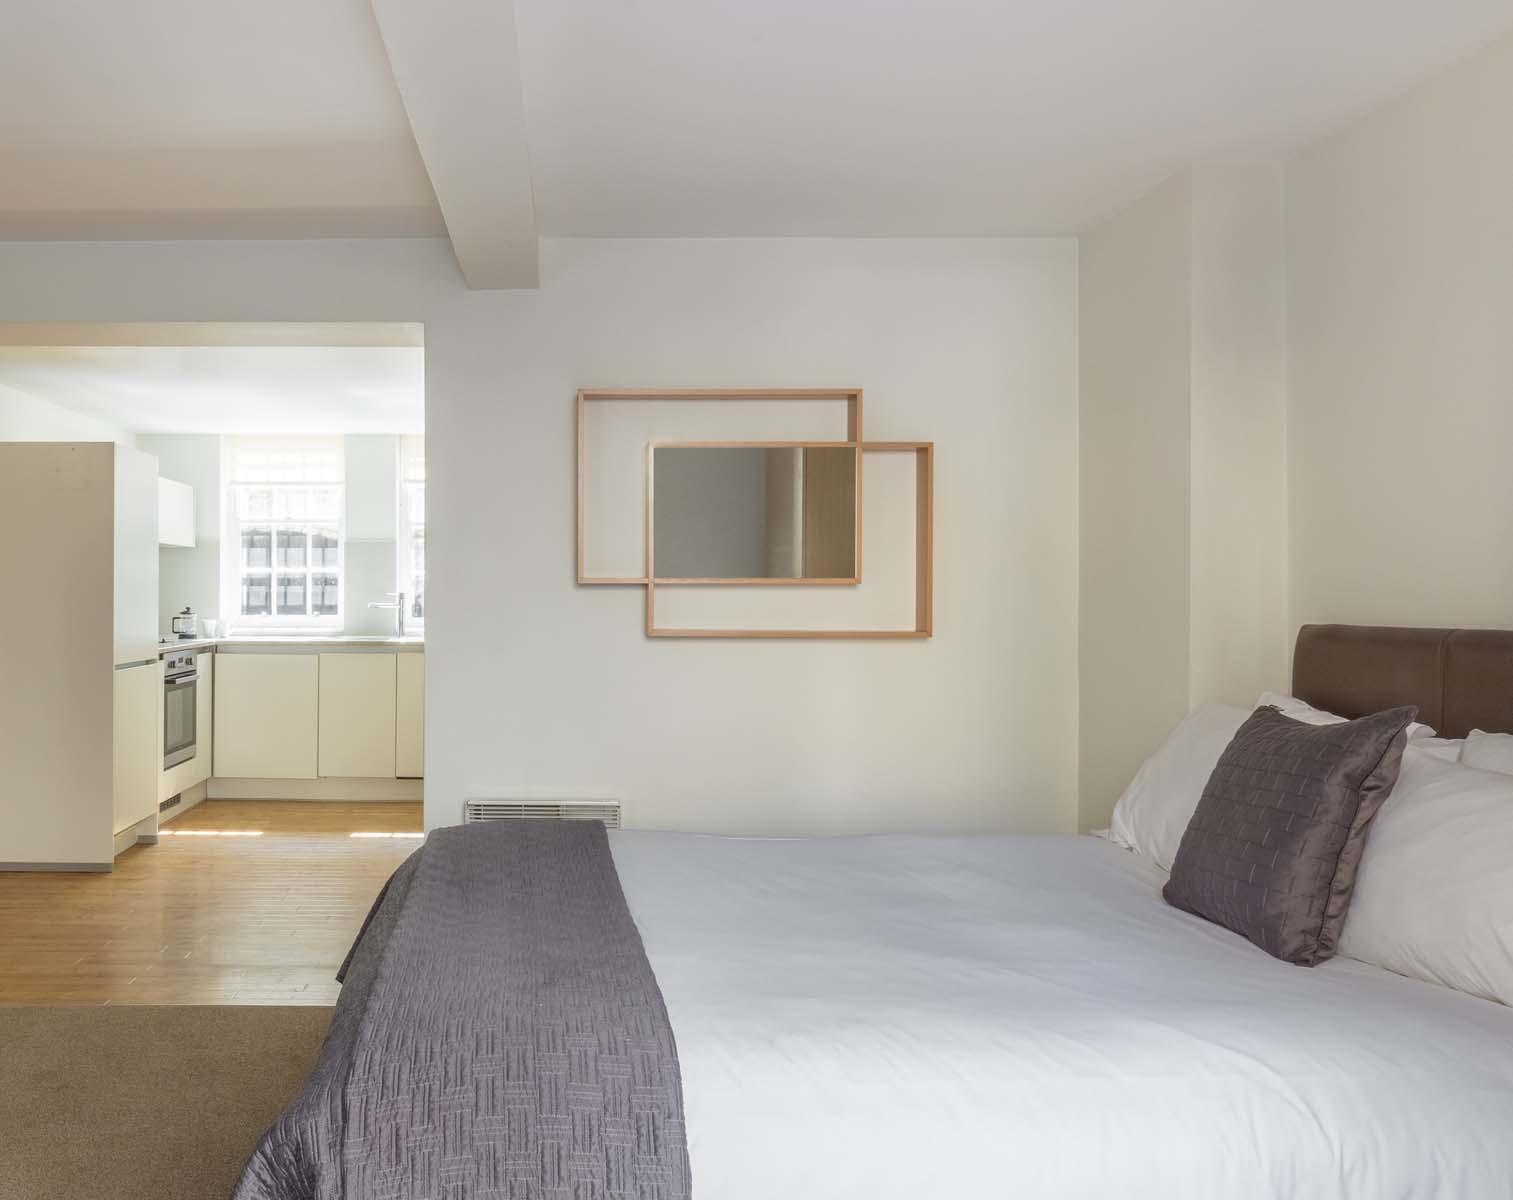 Cosy bedroom at Saco Bath – St James's Parade - Citybase Apartments